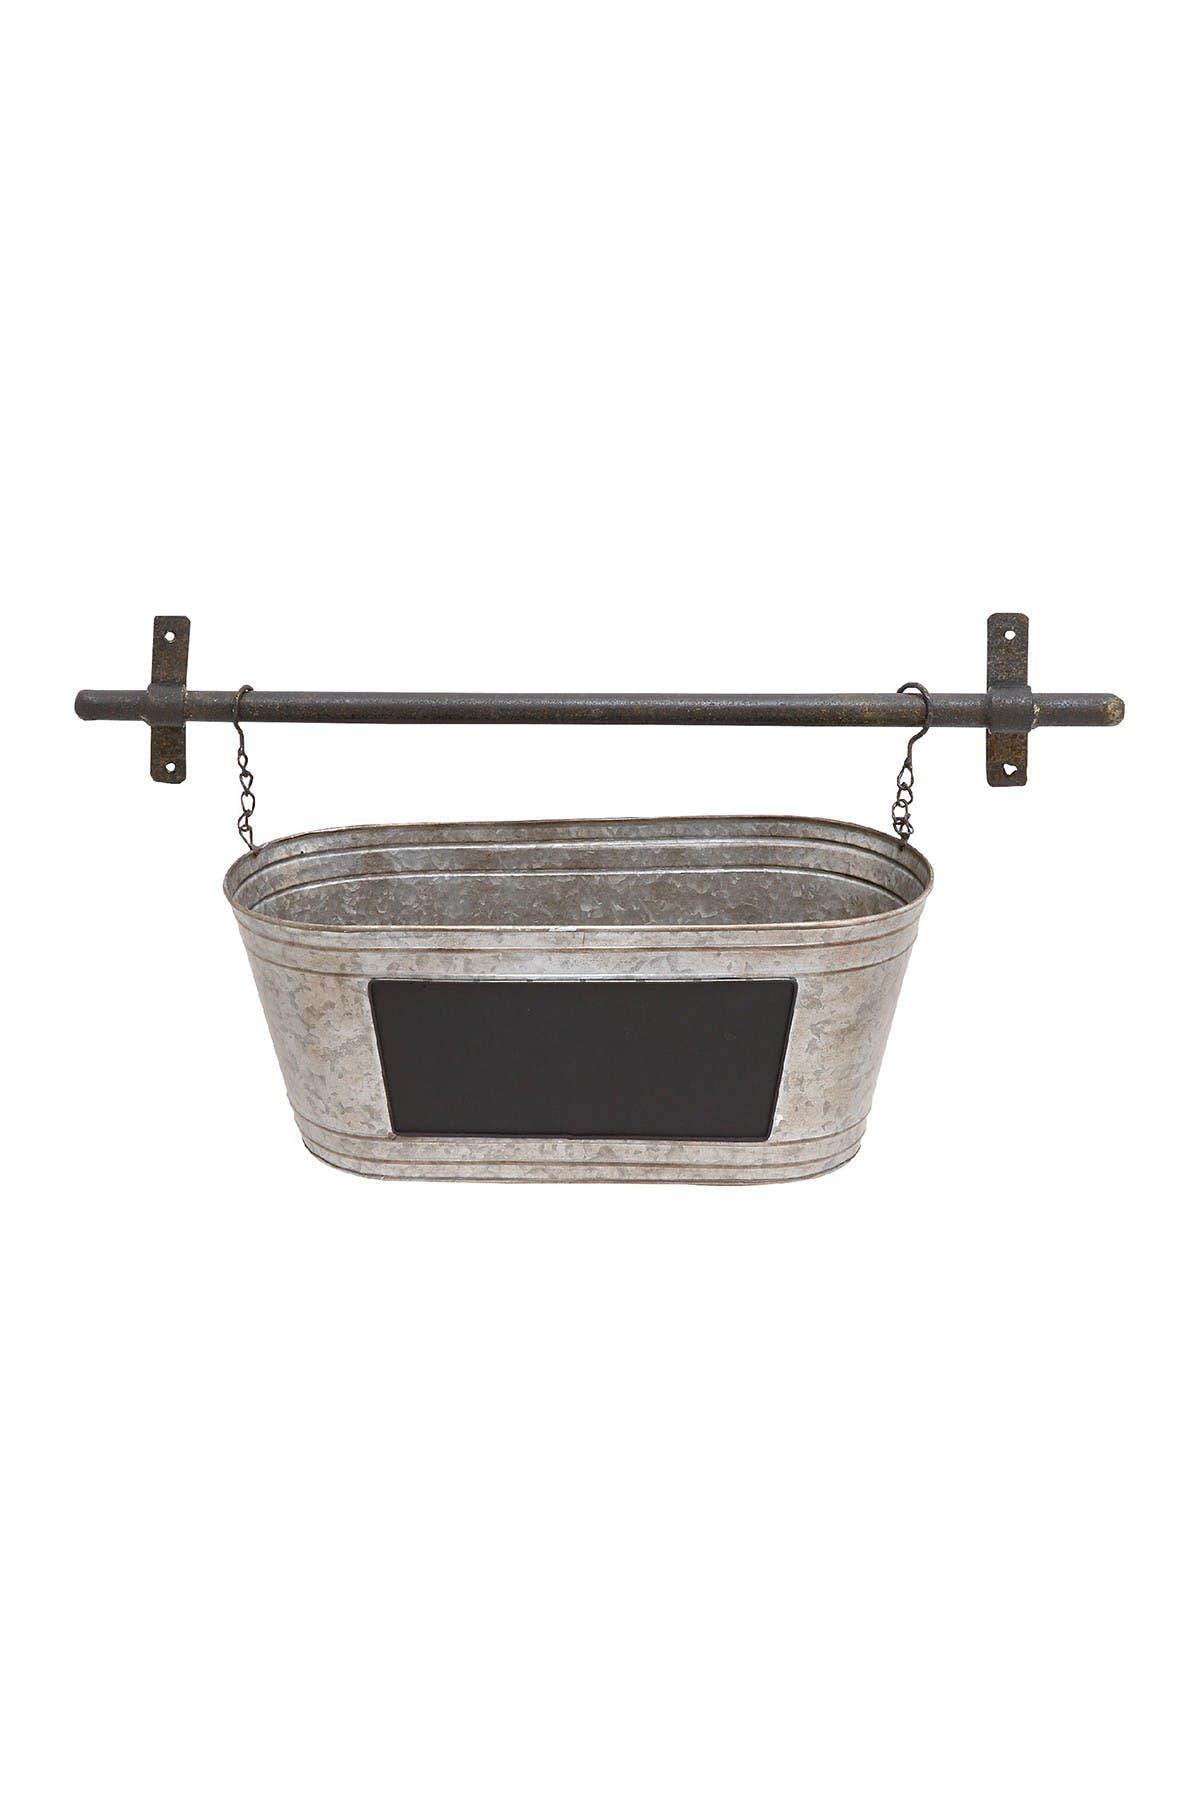 Image of Willow Row Grey Farmhouse Hanging Tub Planter